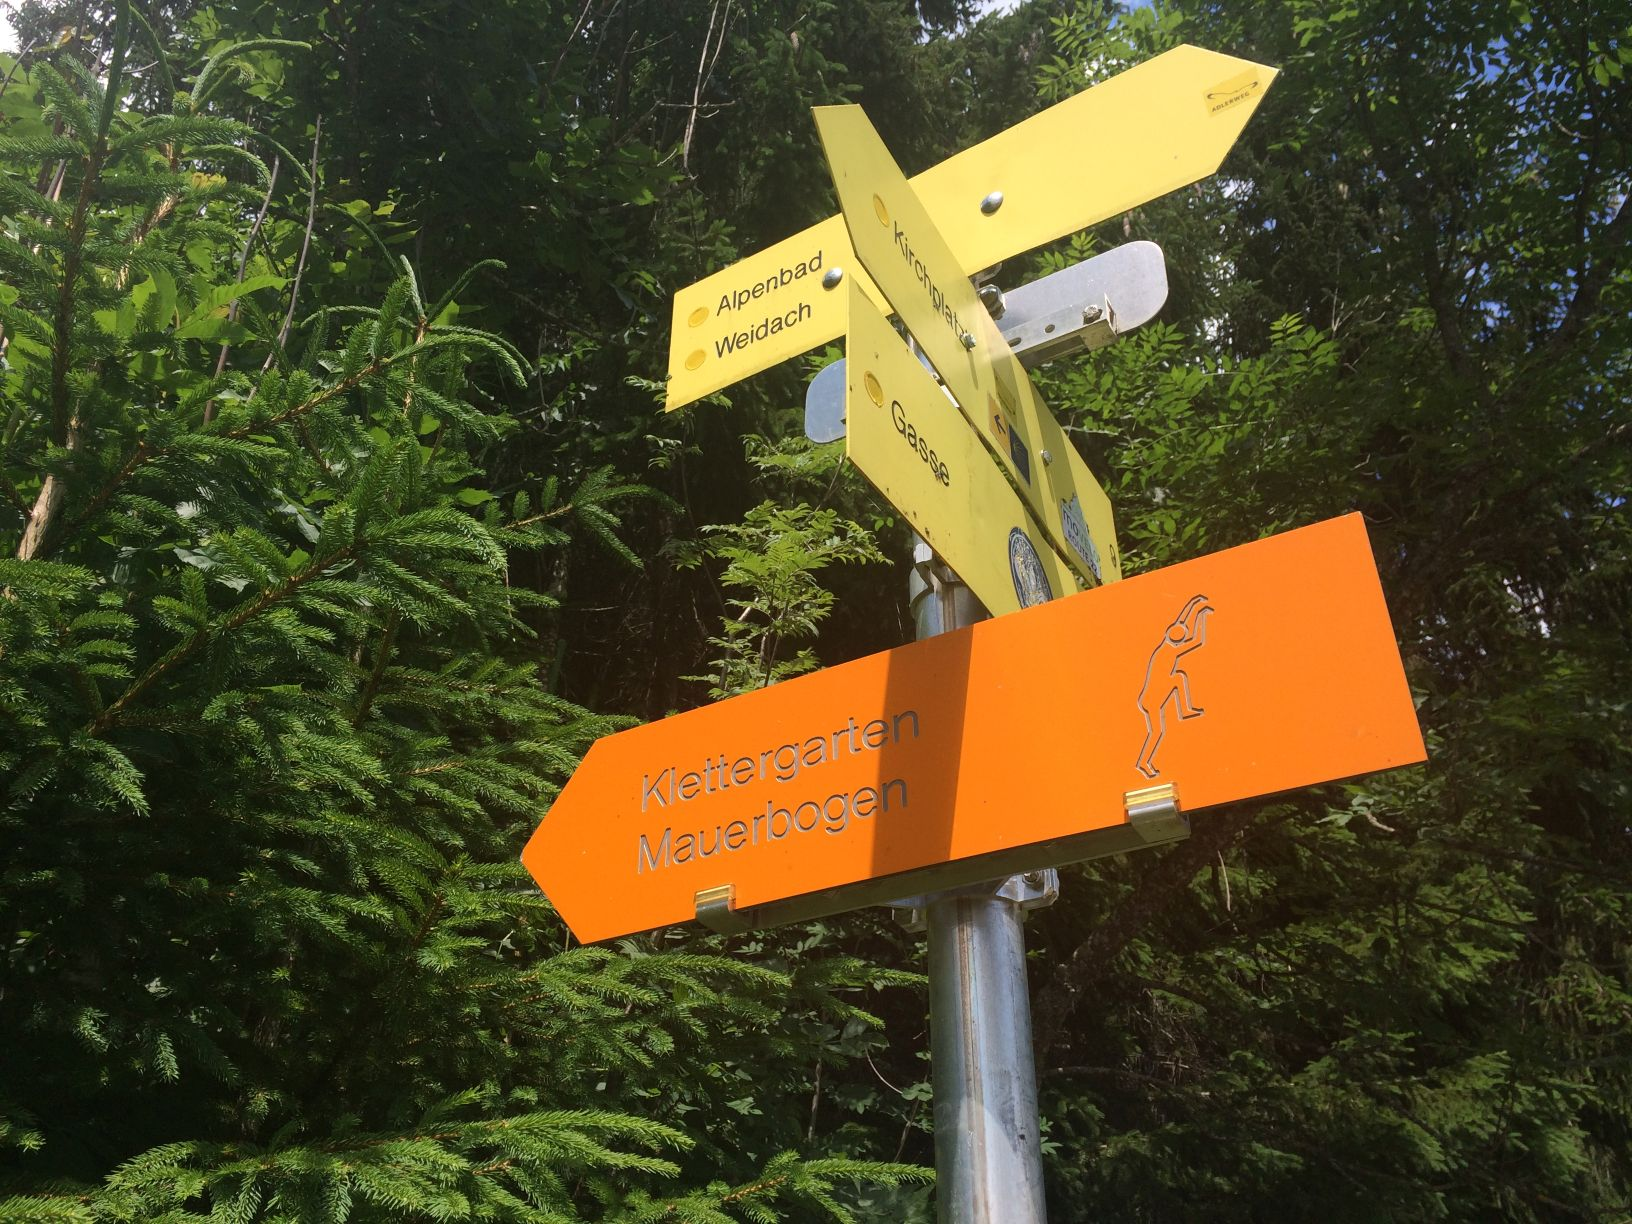 Hinweisschilder in der Olympiaregion Seefeld | Climbers Paradise